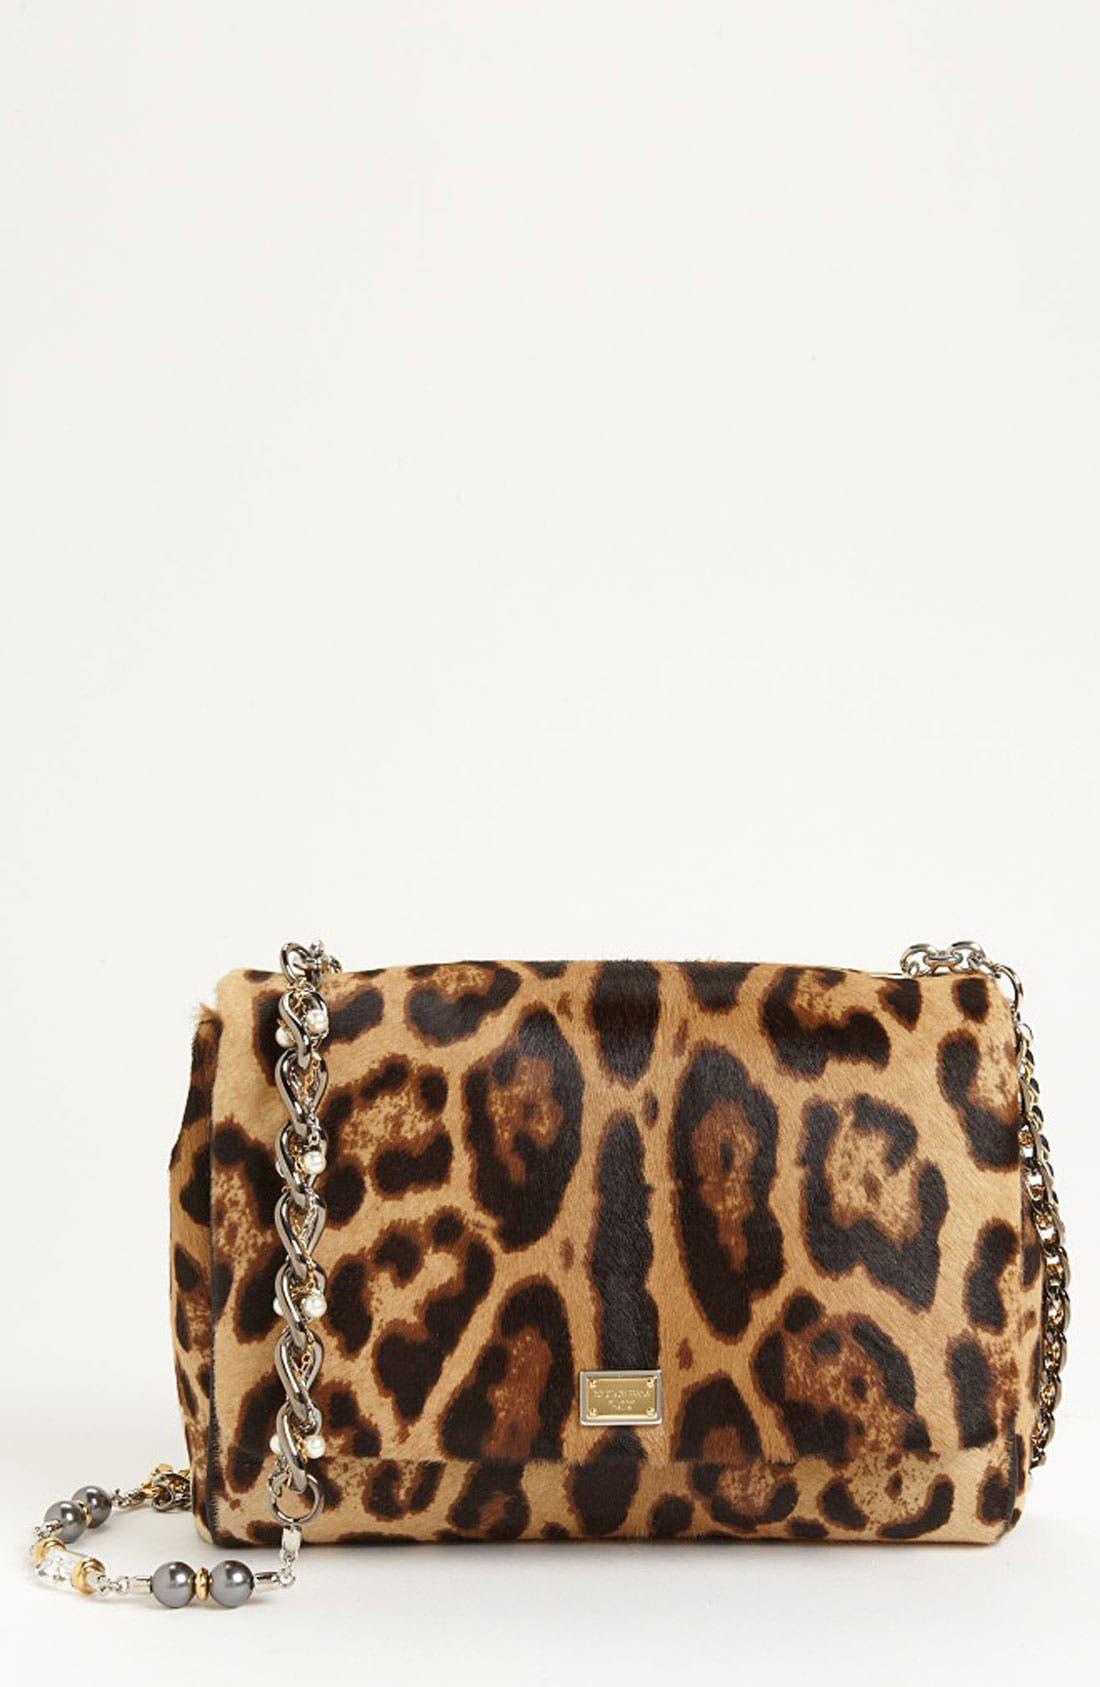 Alternate Image 1 Selected - Dolce&Gabbana 'Miss Charles' Calf Hair Shoulder Bag